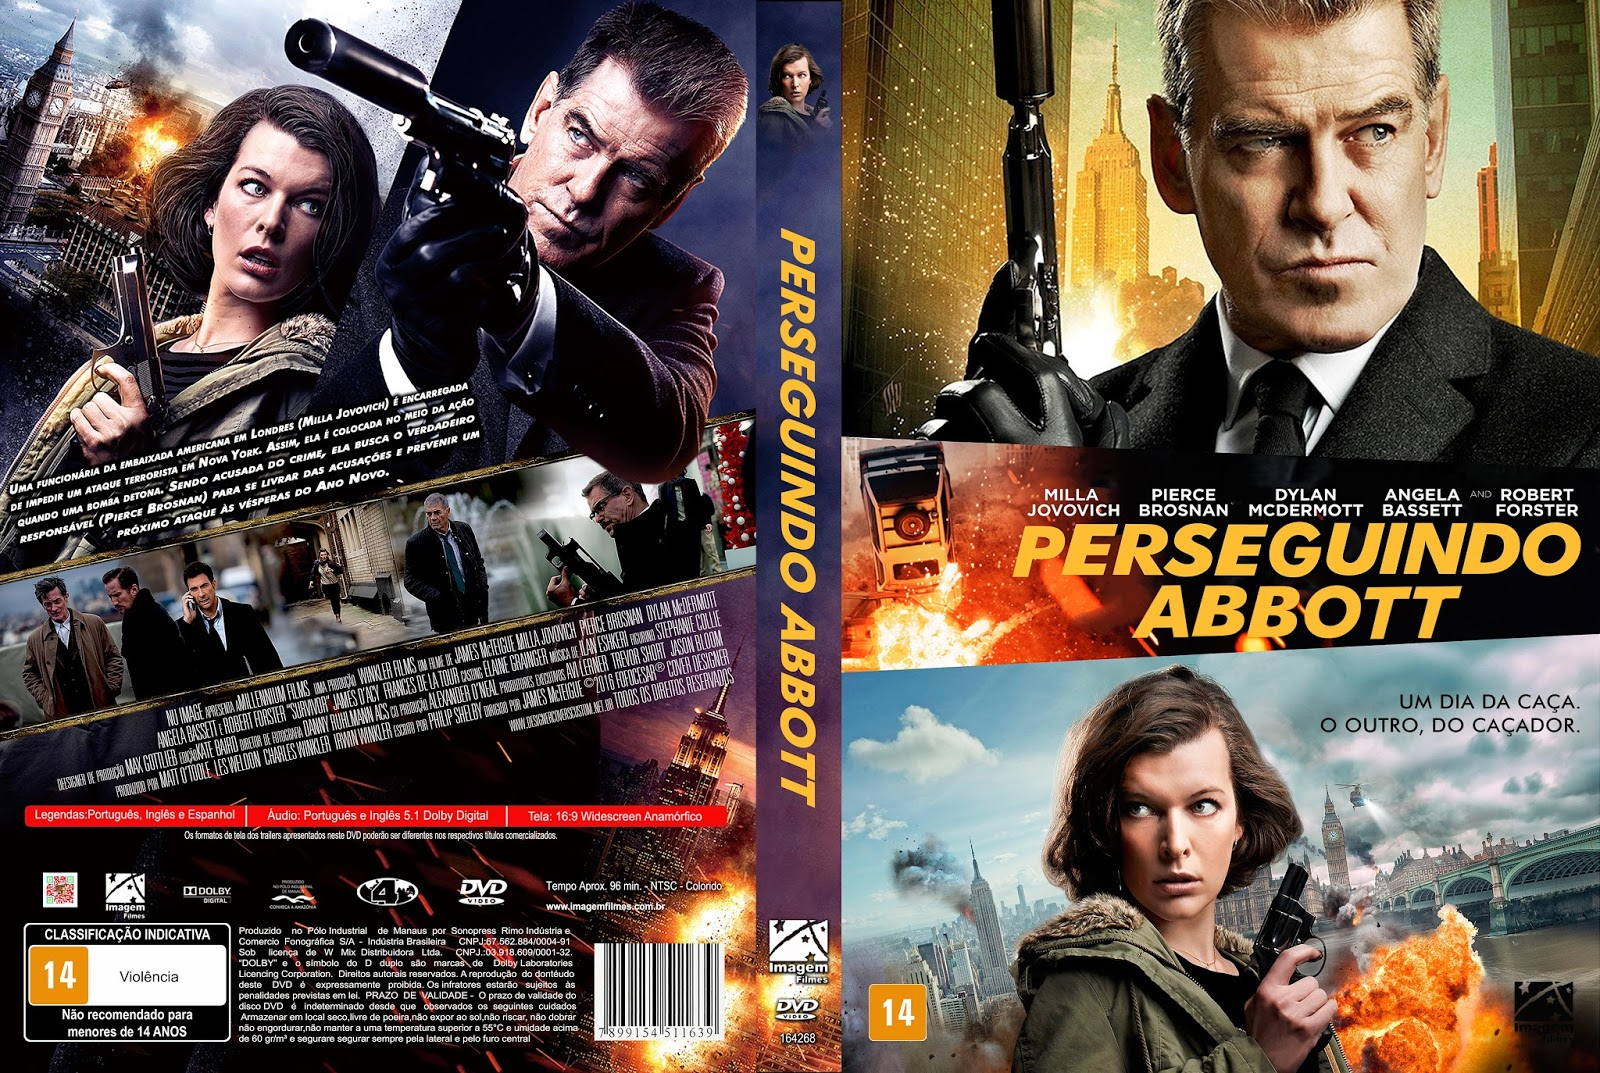 Perseguindo Abbott DVD-R Perseguindo 2BAbbott 2B  2BXANDAO 2BDOWNLOAD